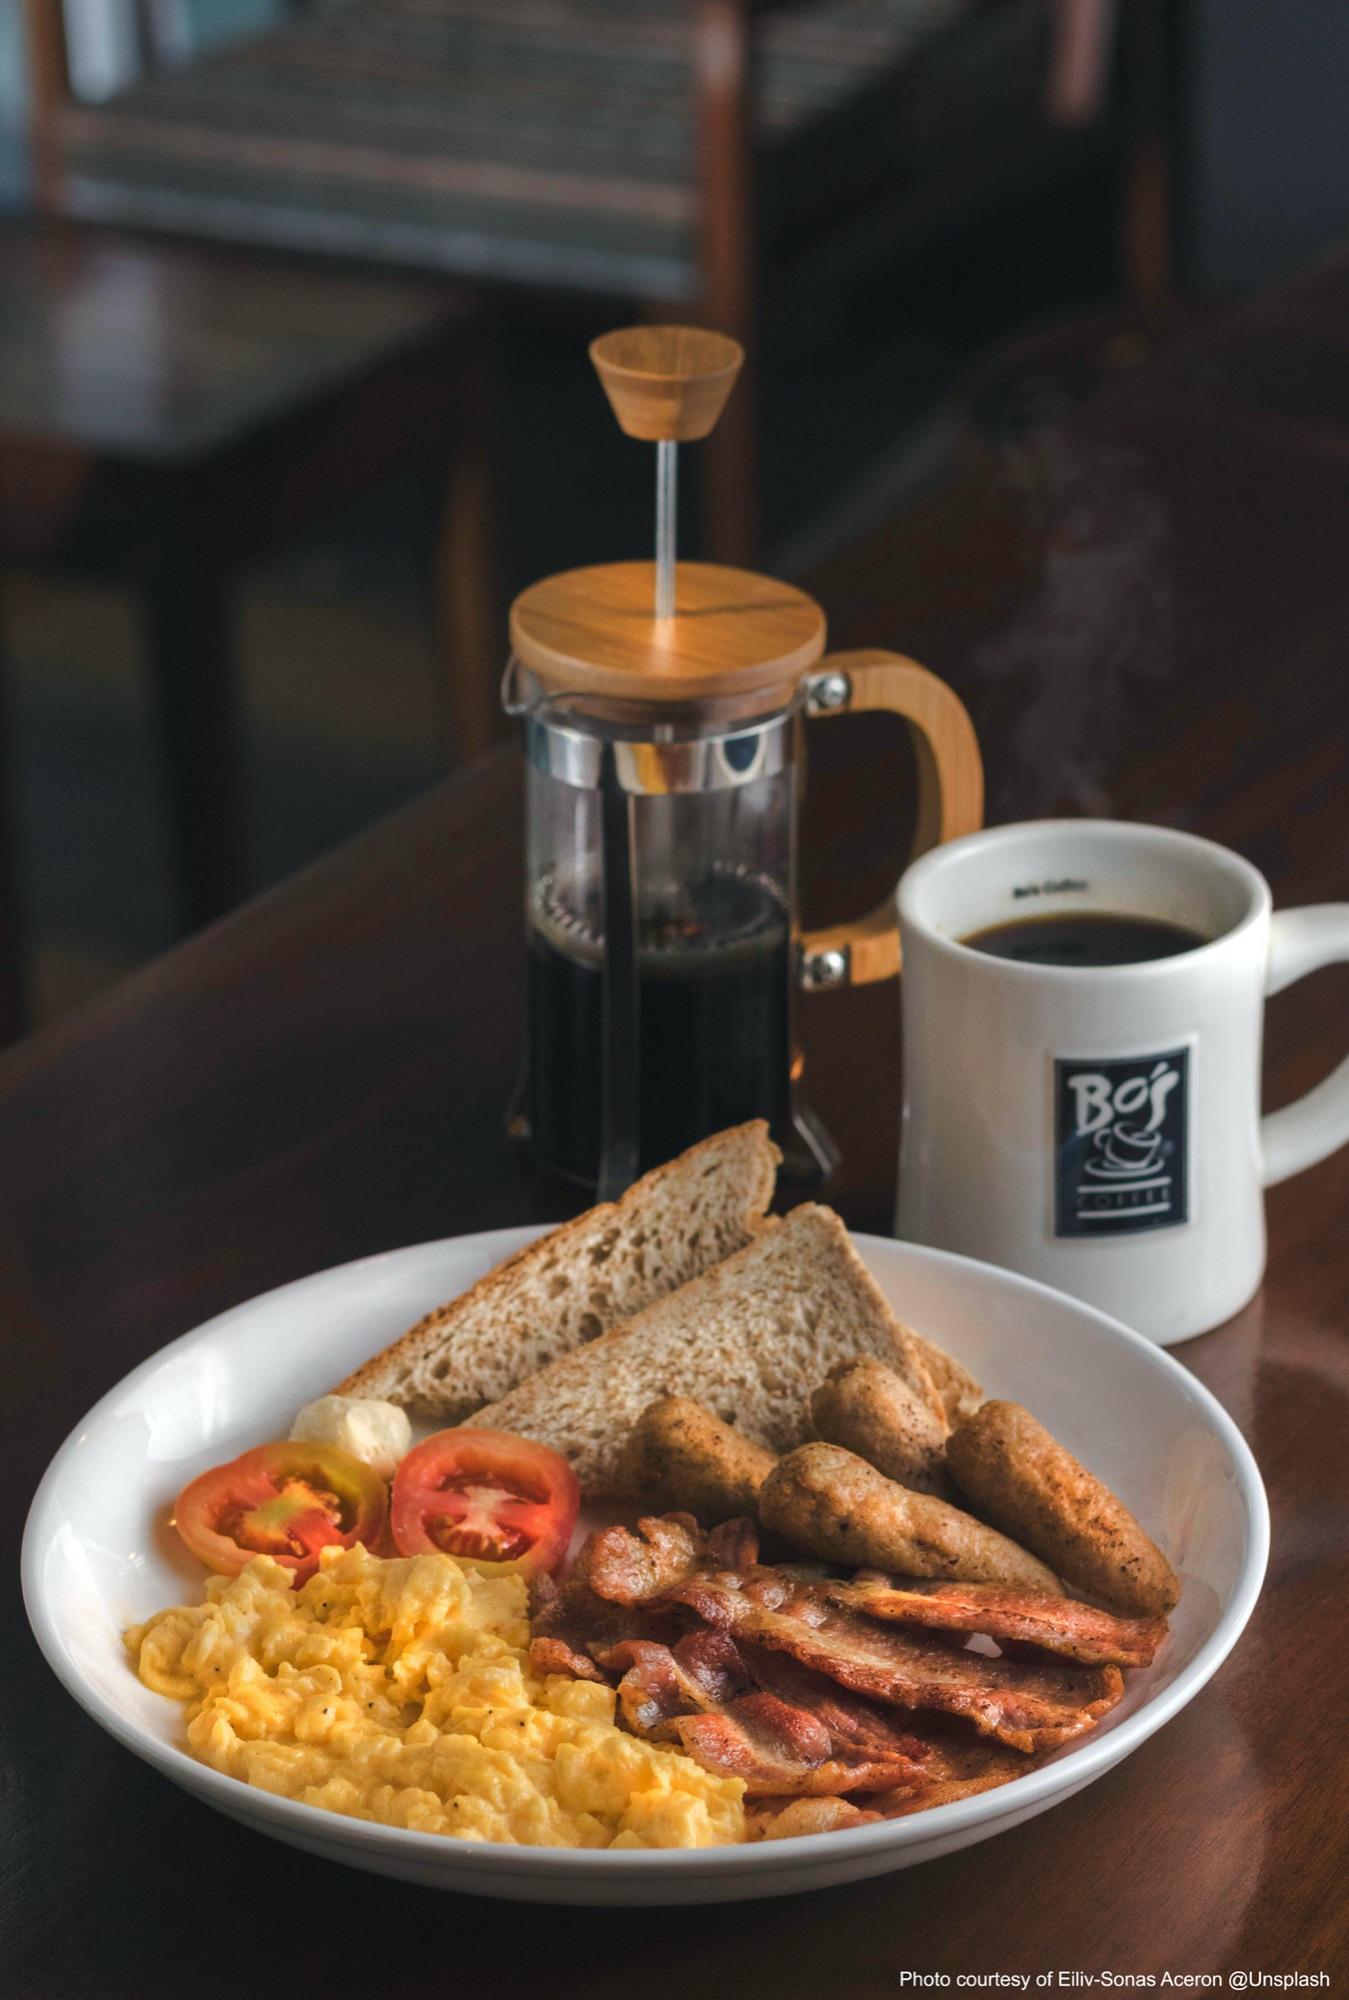 Cooked breakfast by Eiliv-Sonas Aceron on Unsplash